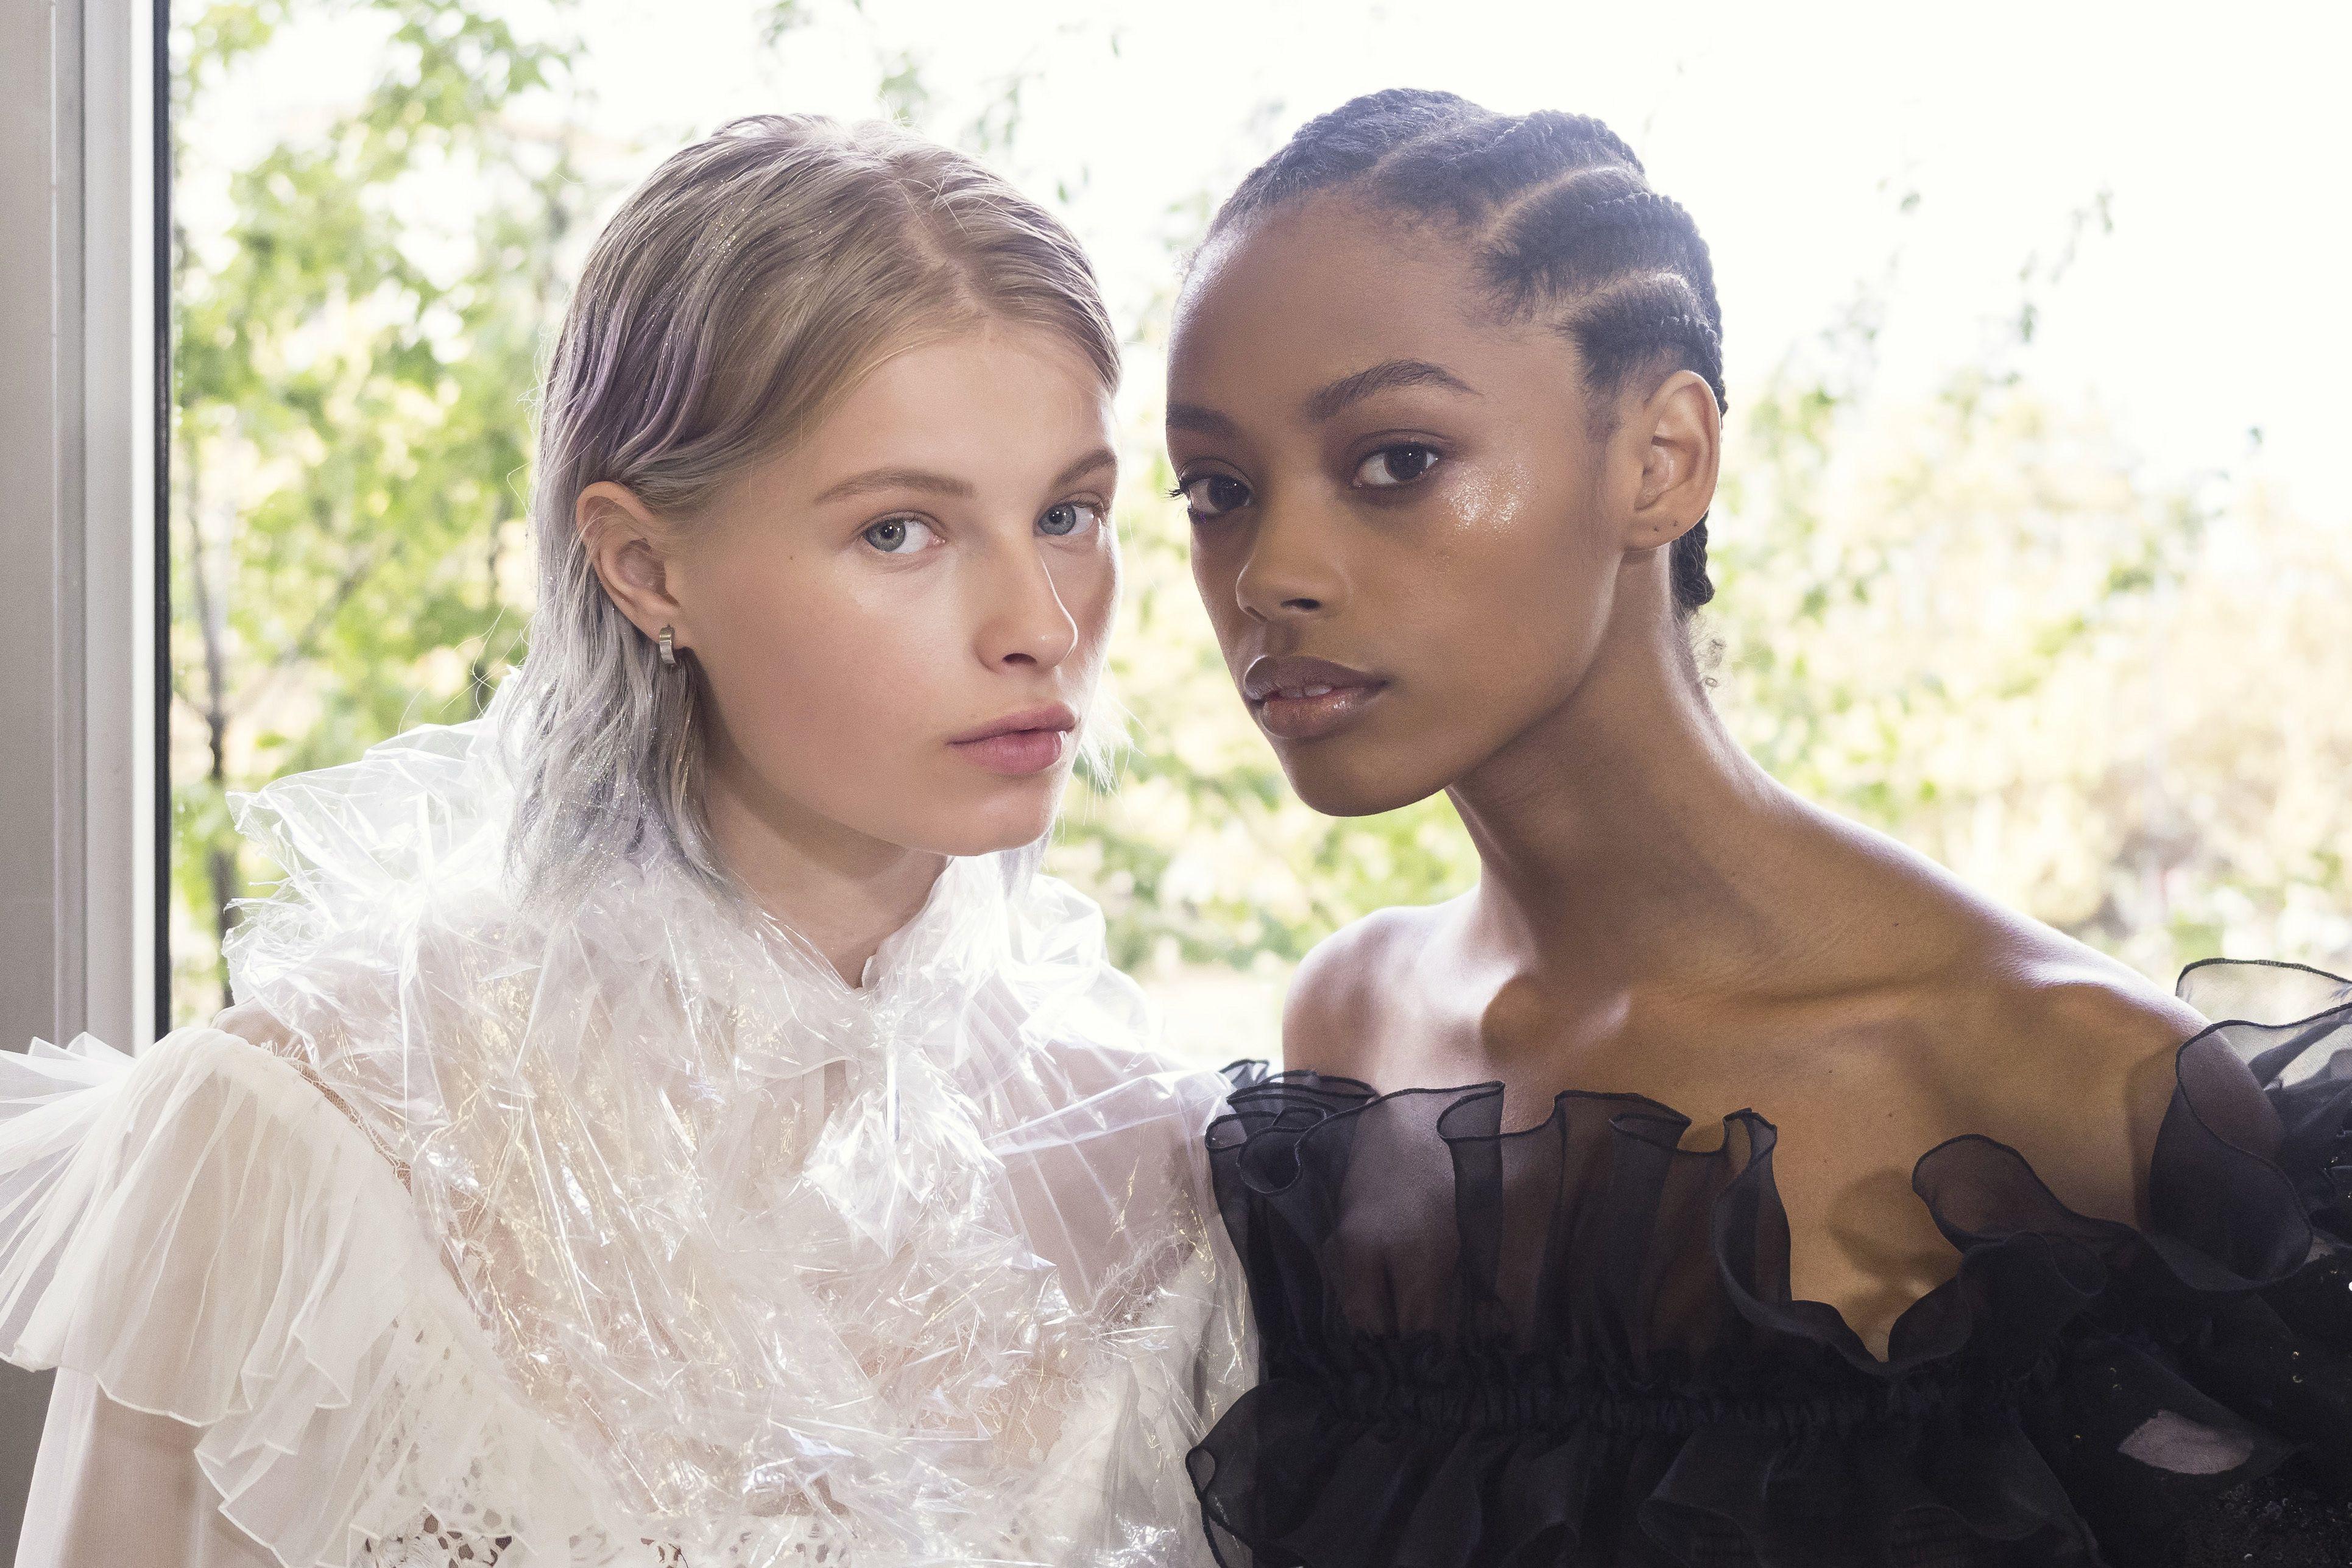 Diy Bridesmaid Makeup Tutorial And Tips